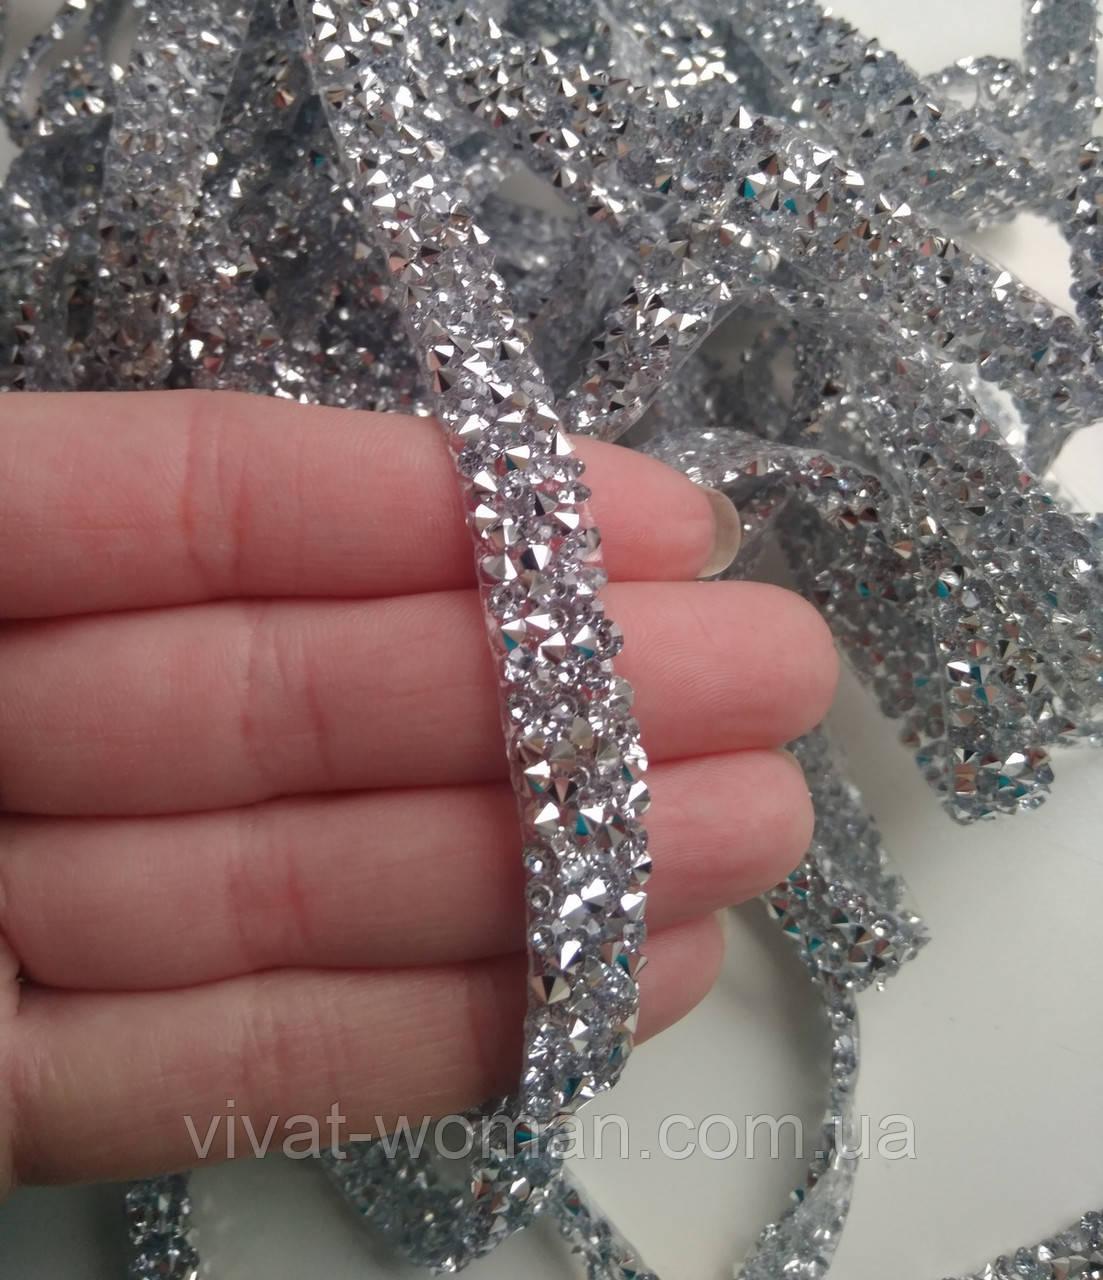 Стразовая термо тесьма из конусных страз Crystal/Silver, шир.1 см. Цена за 0,5 м